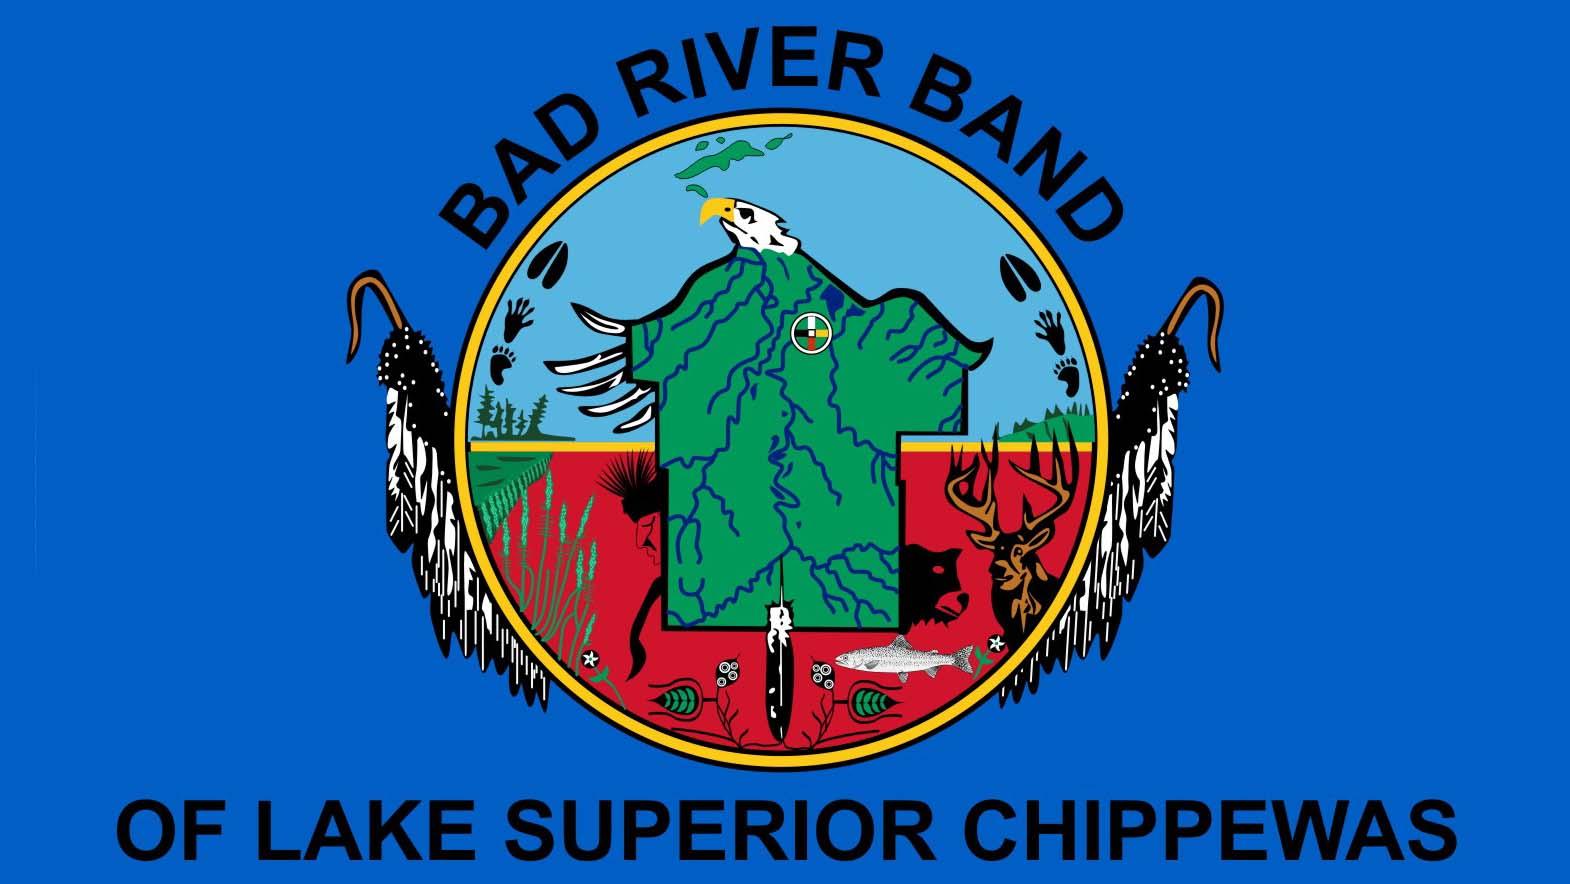 Bad_River_Band.jpg